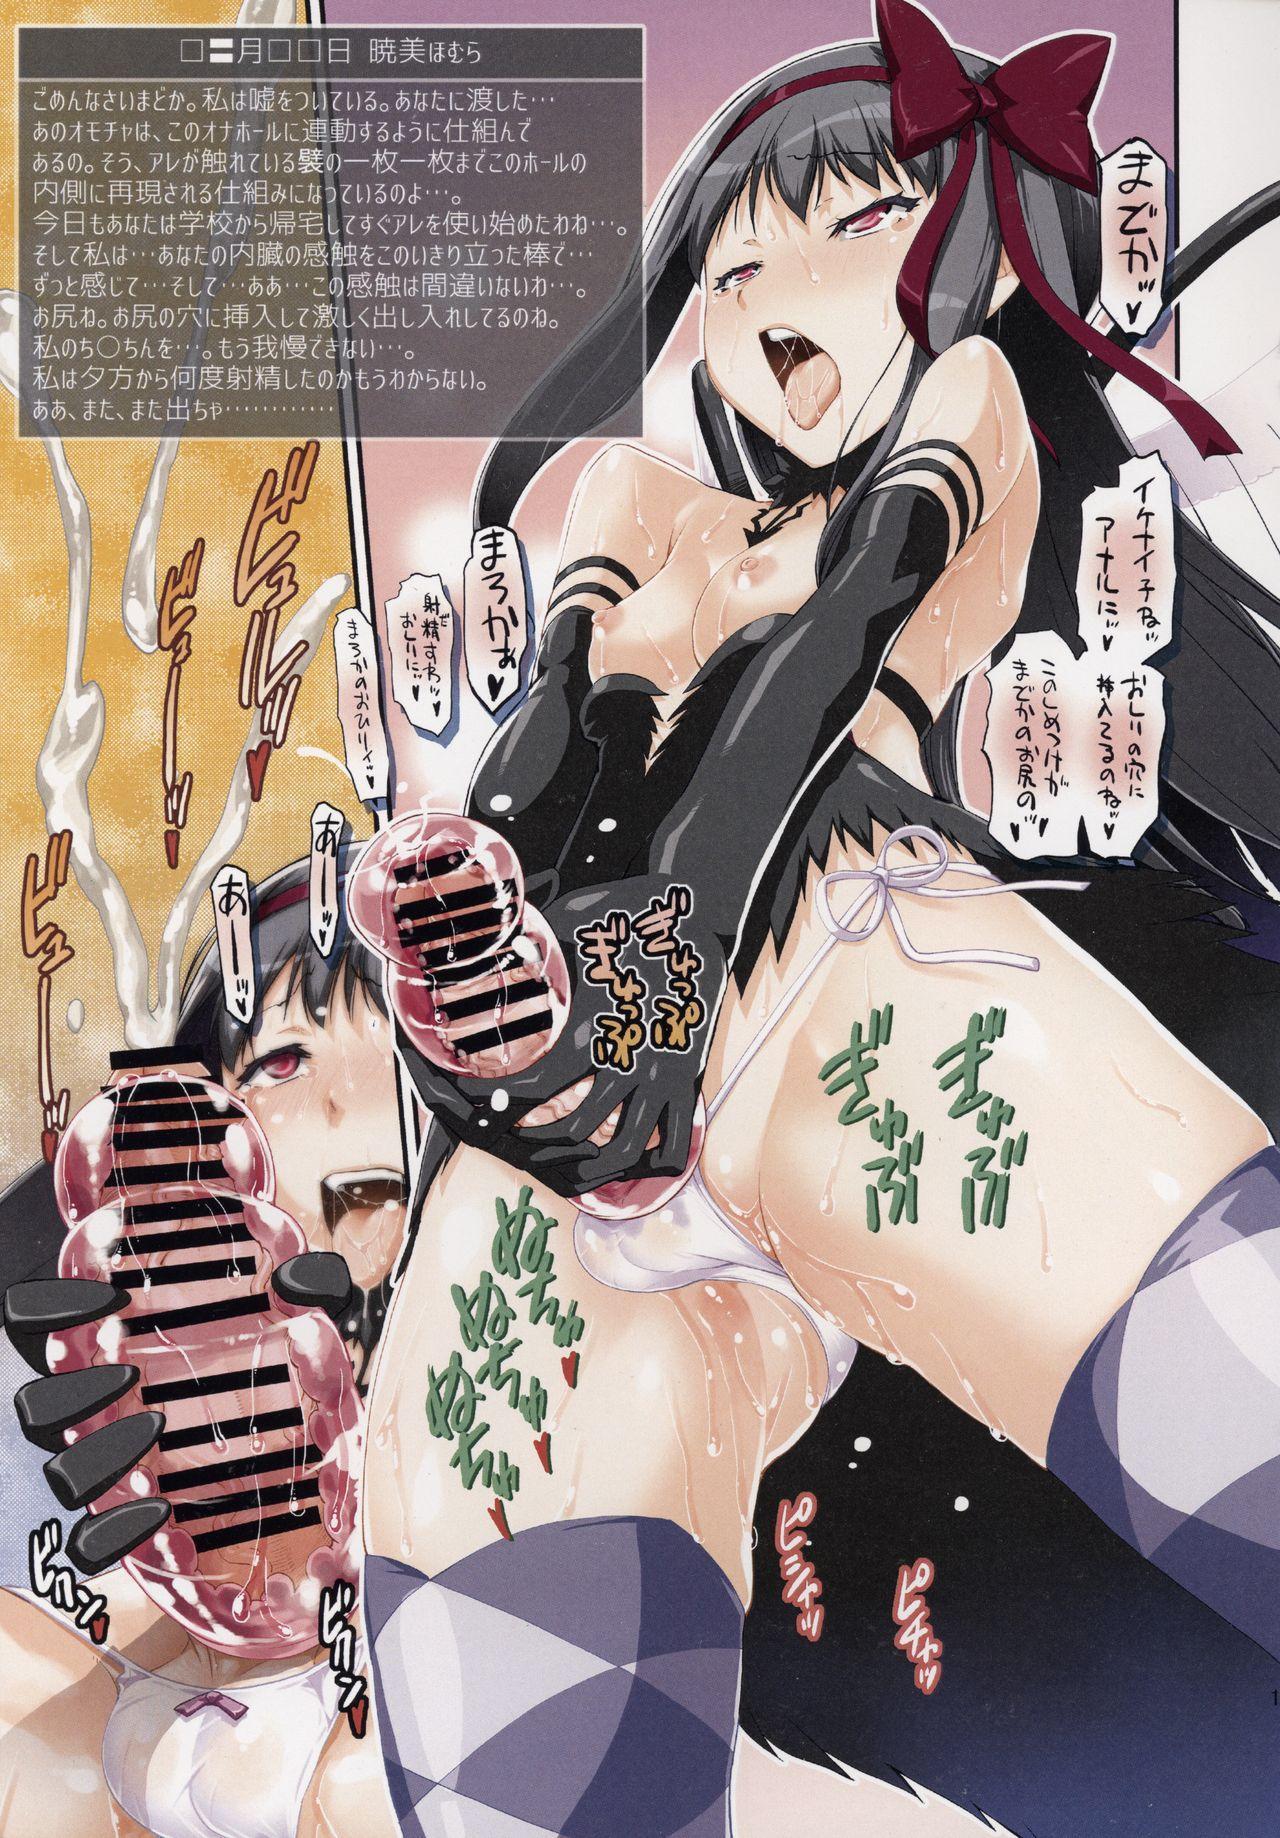 Mahou Shoujo Madoka Magica Gehin Ero Enikki Goudou 14